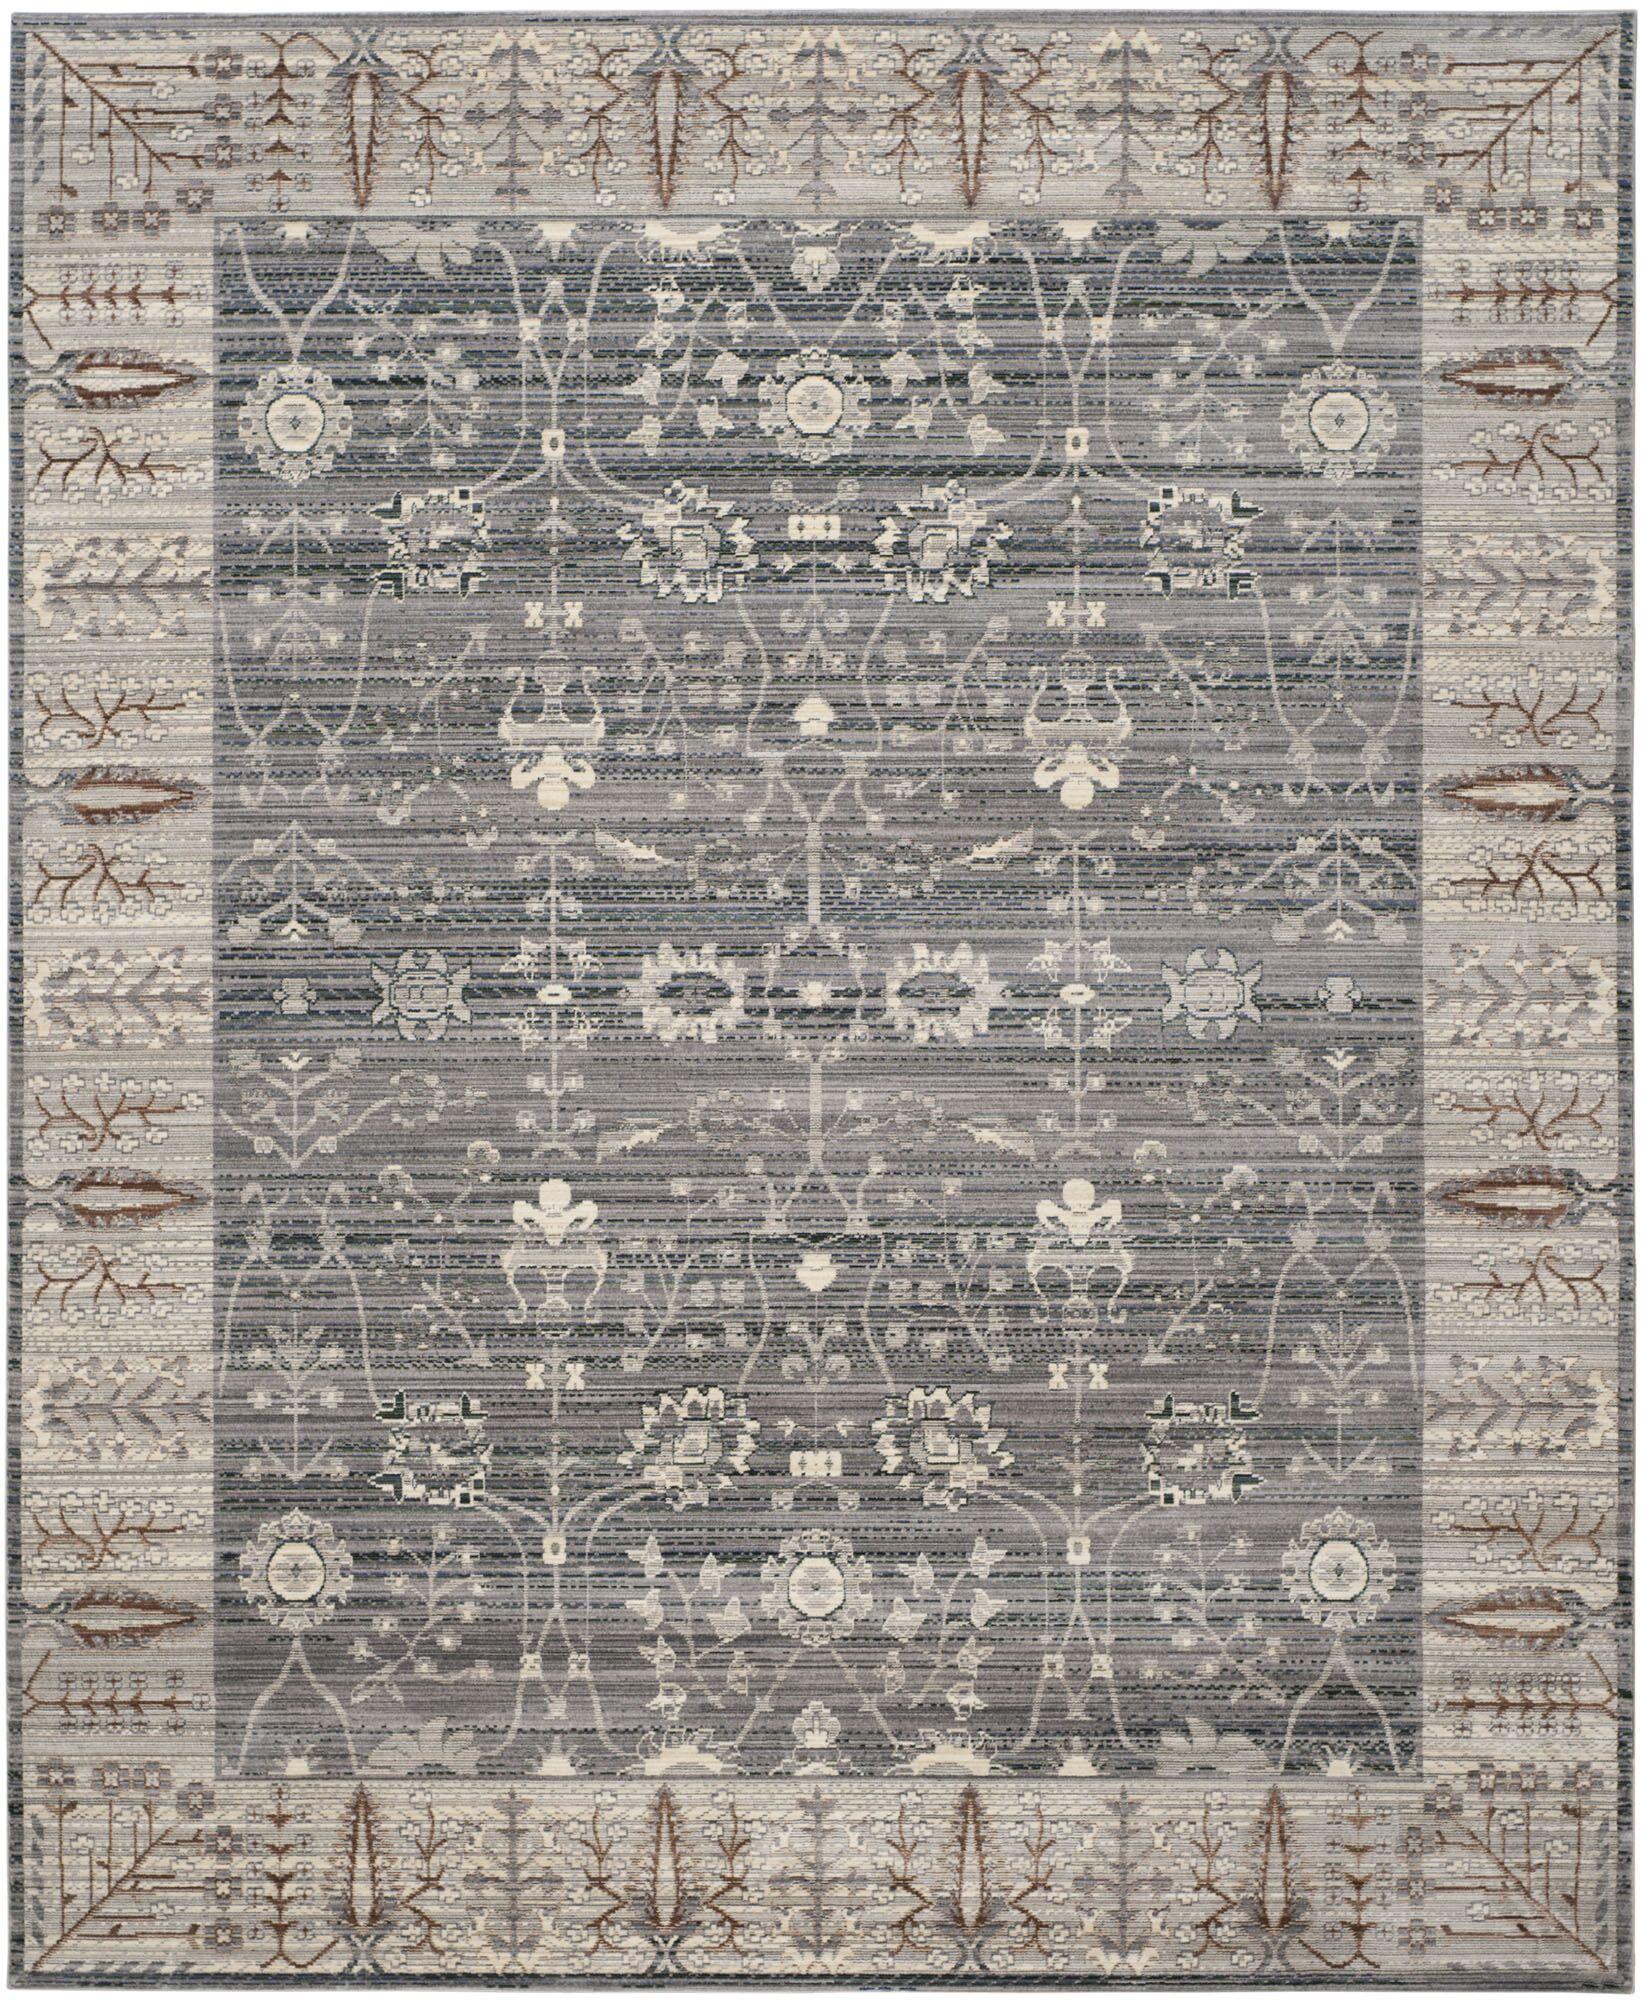 Filton Dark Gray/Light Gray Area Rug Rug Size: Rectangle 8' x 10'